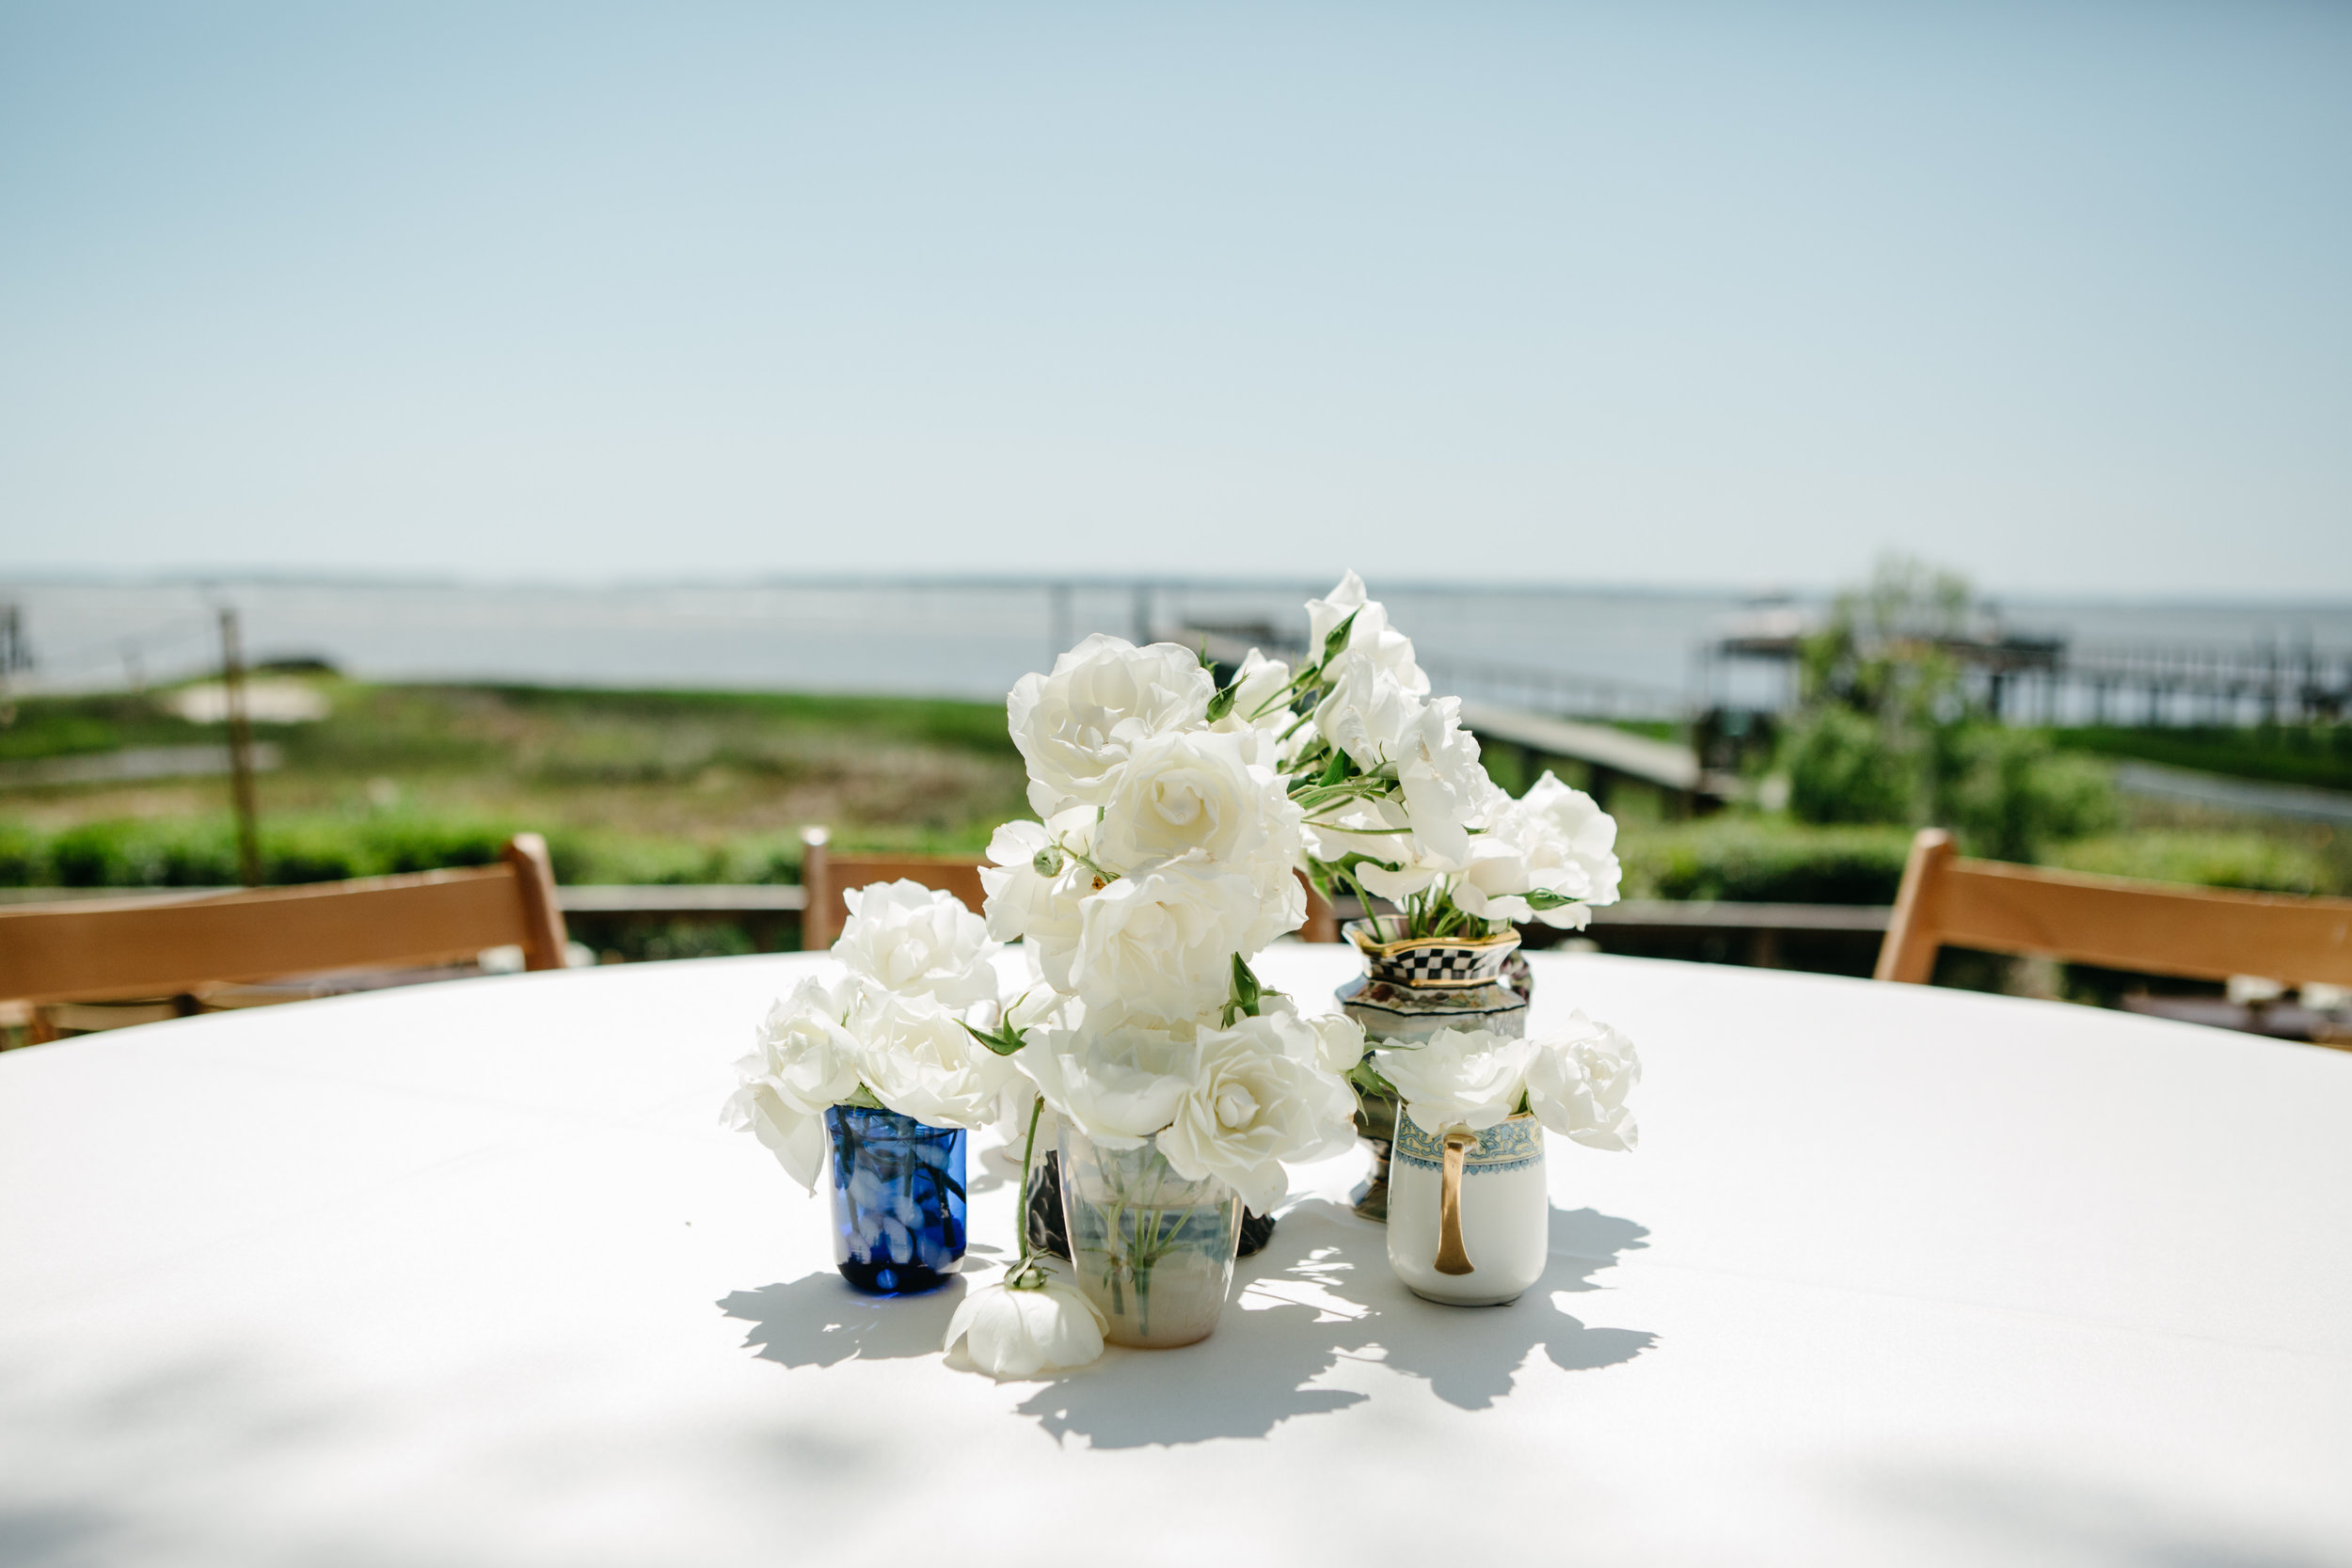 paraiso-event-design-charleston-mount-pleasant-waterfront-wedding-private-home-16.jpg